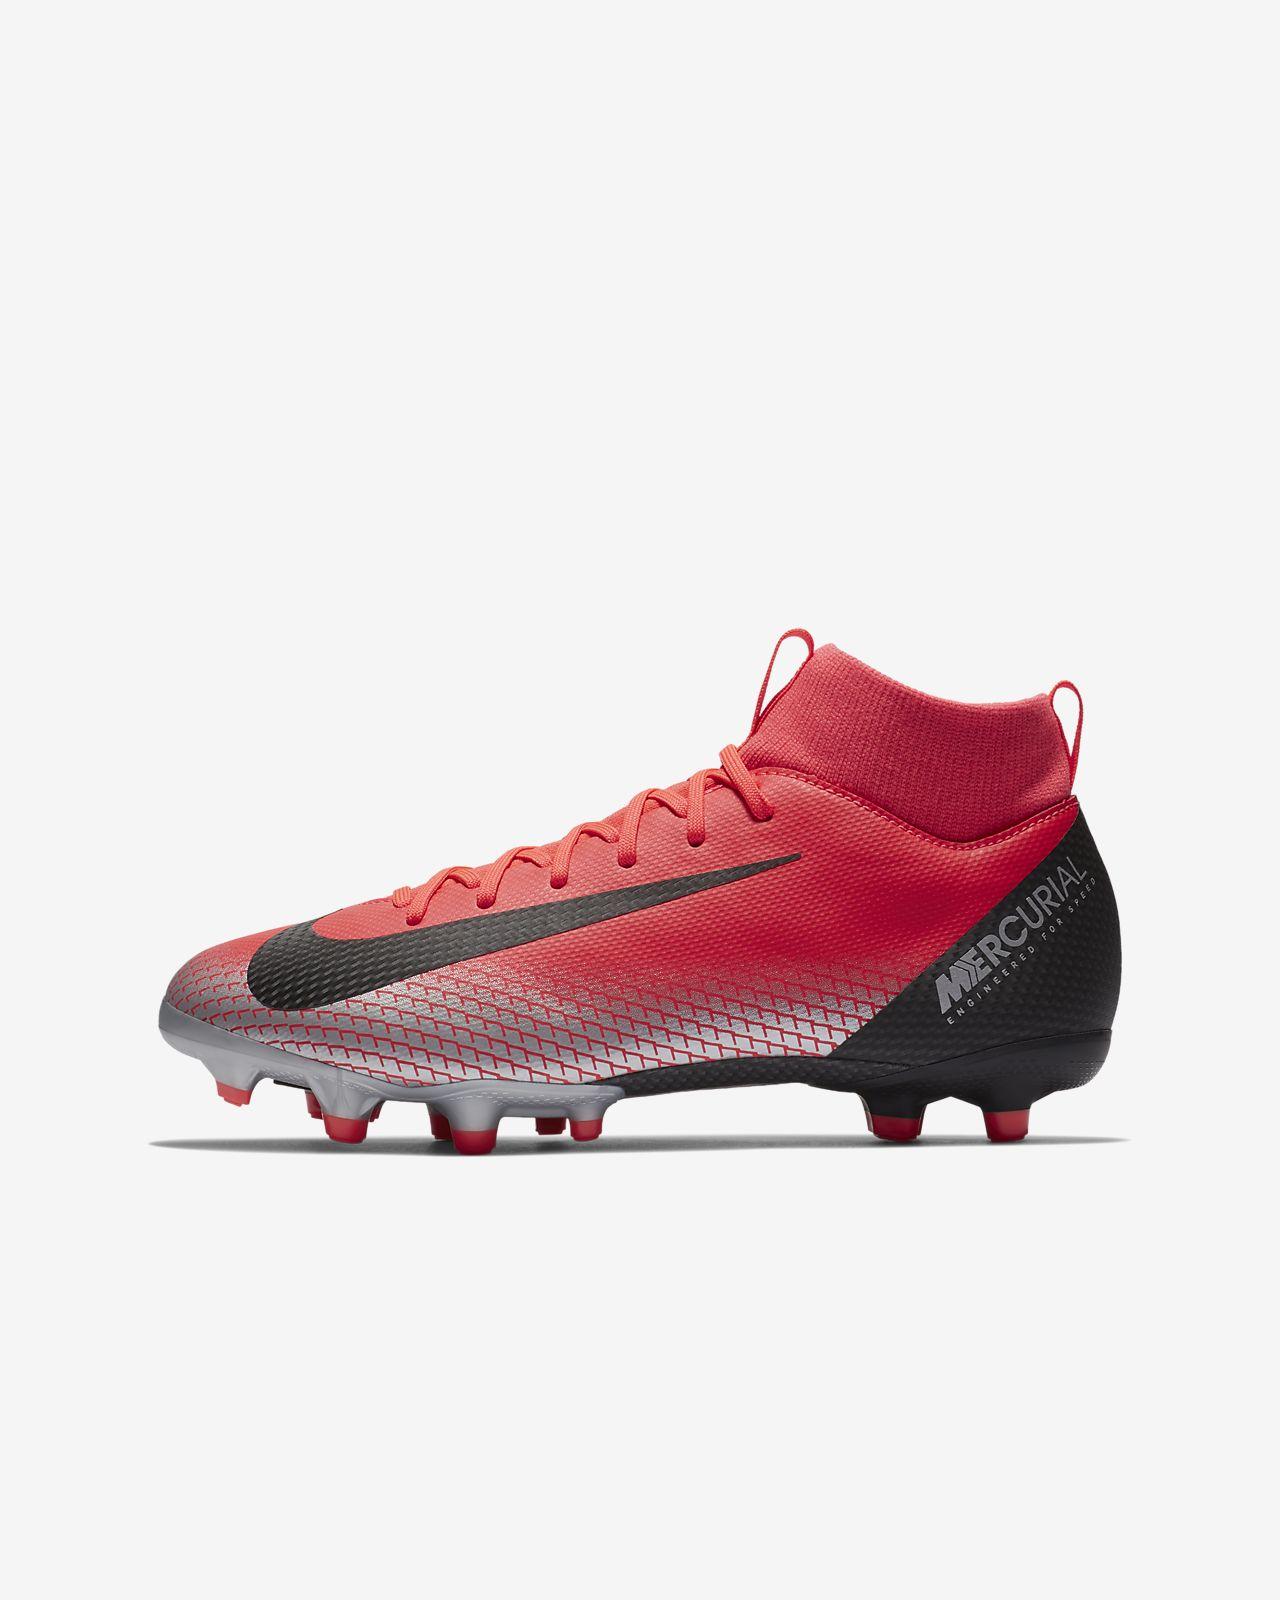 ... Scarpa da calcio multiterreno Nike Jr. Superfly 6 Academy MG -  Bambini Ragazzi 97d7c3cf500